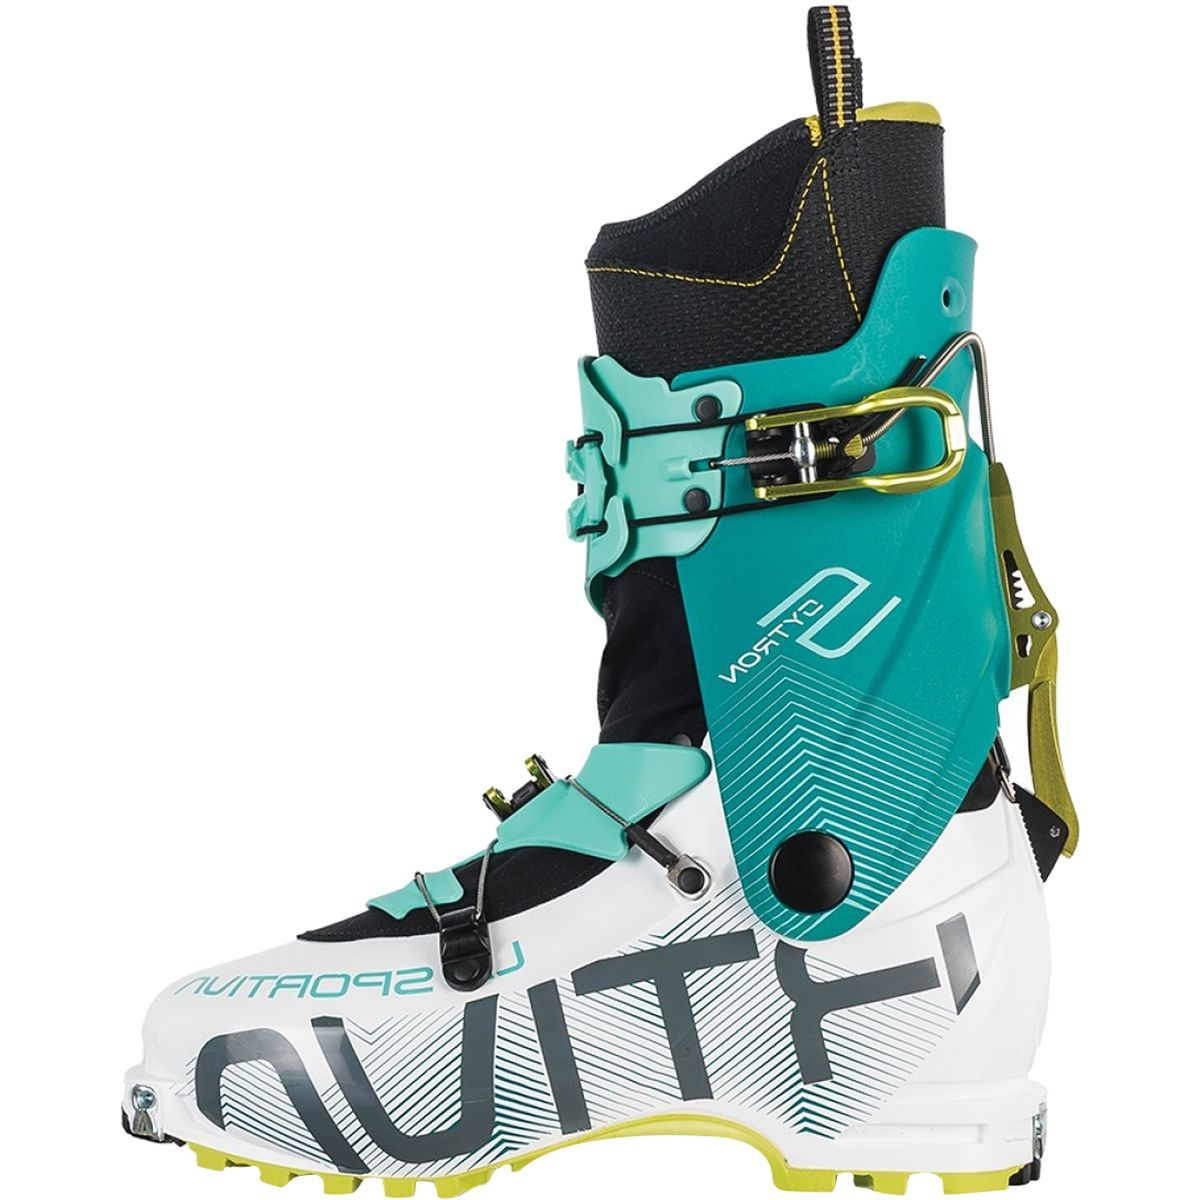 La Sportiva Sytron Alpine Touring Boot - Women's